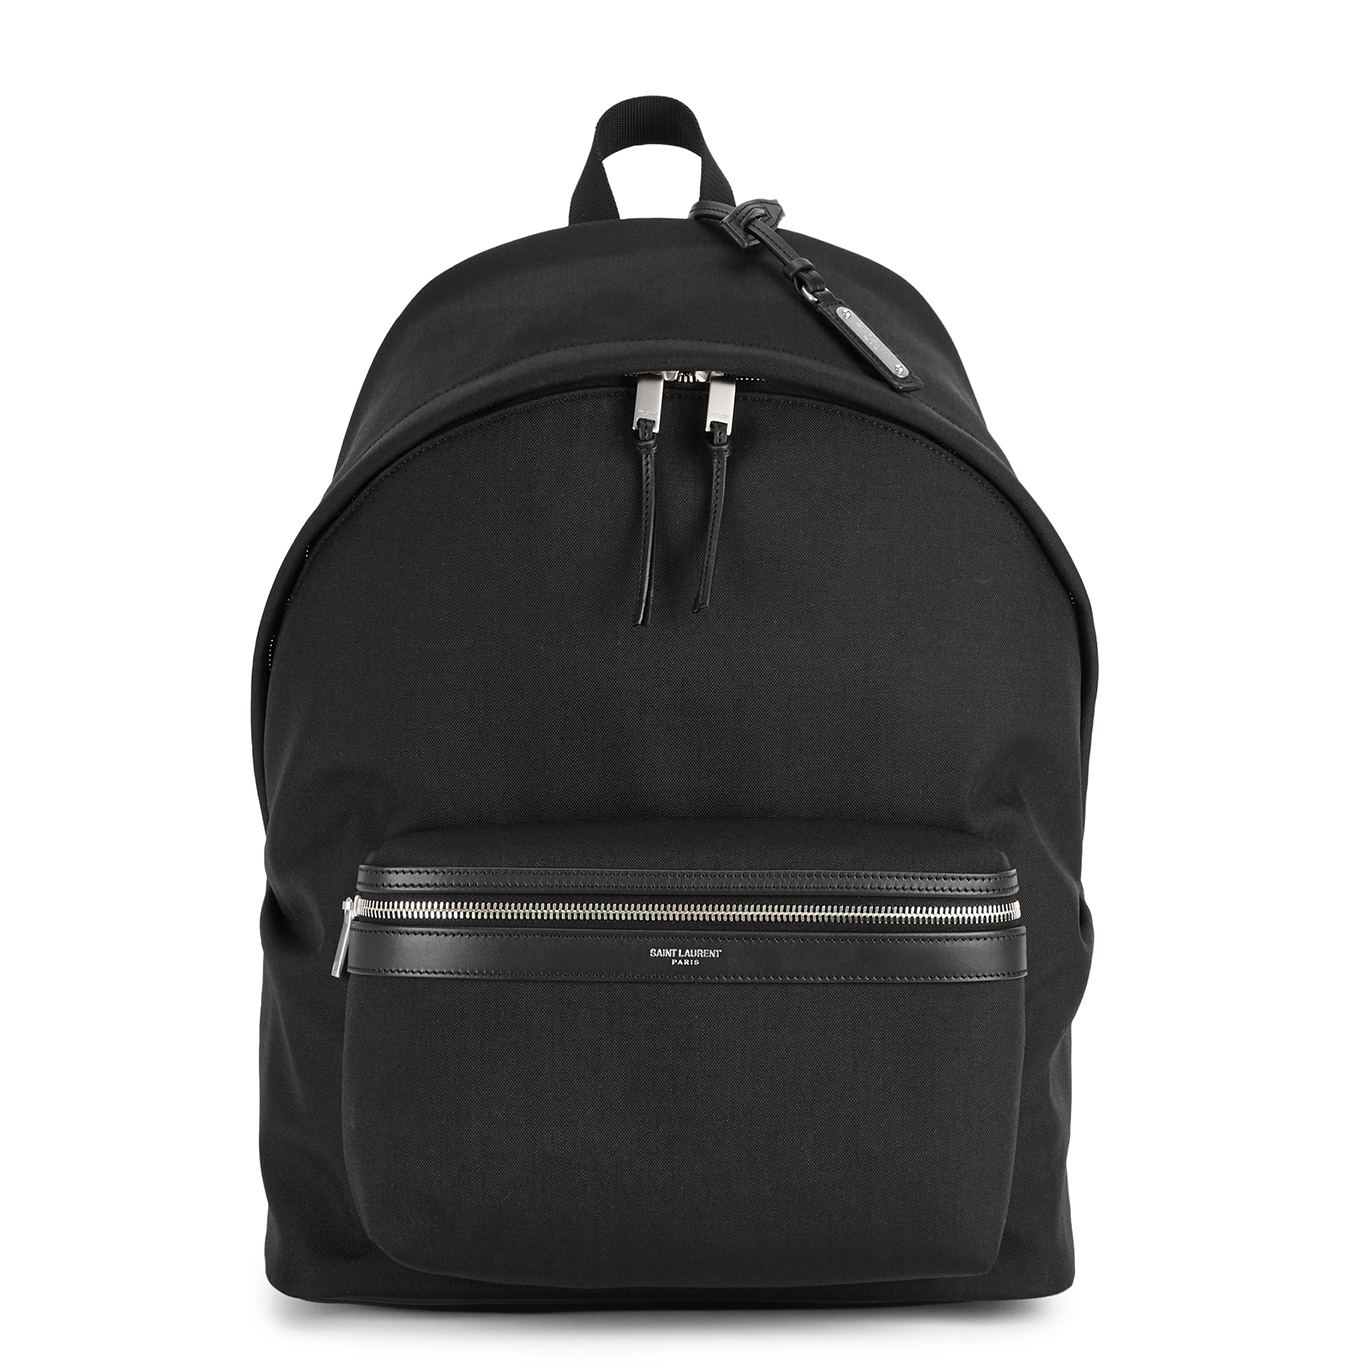 Saint Laurent Black leather-trimmed canvas backpack - Harvey Nichols aec1bb729cb